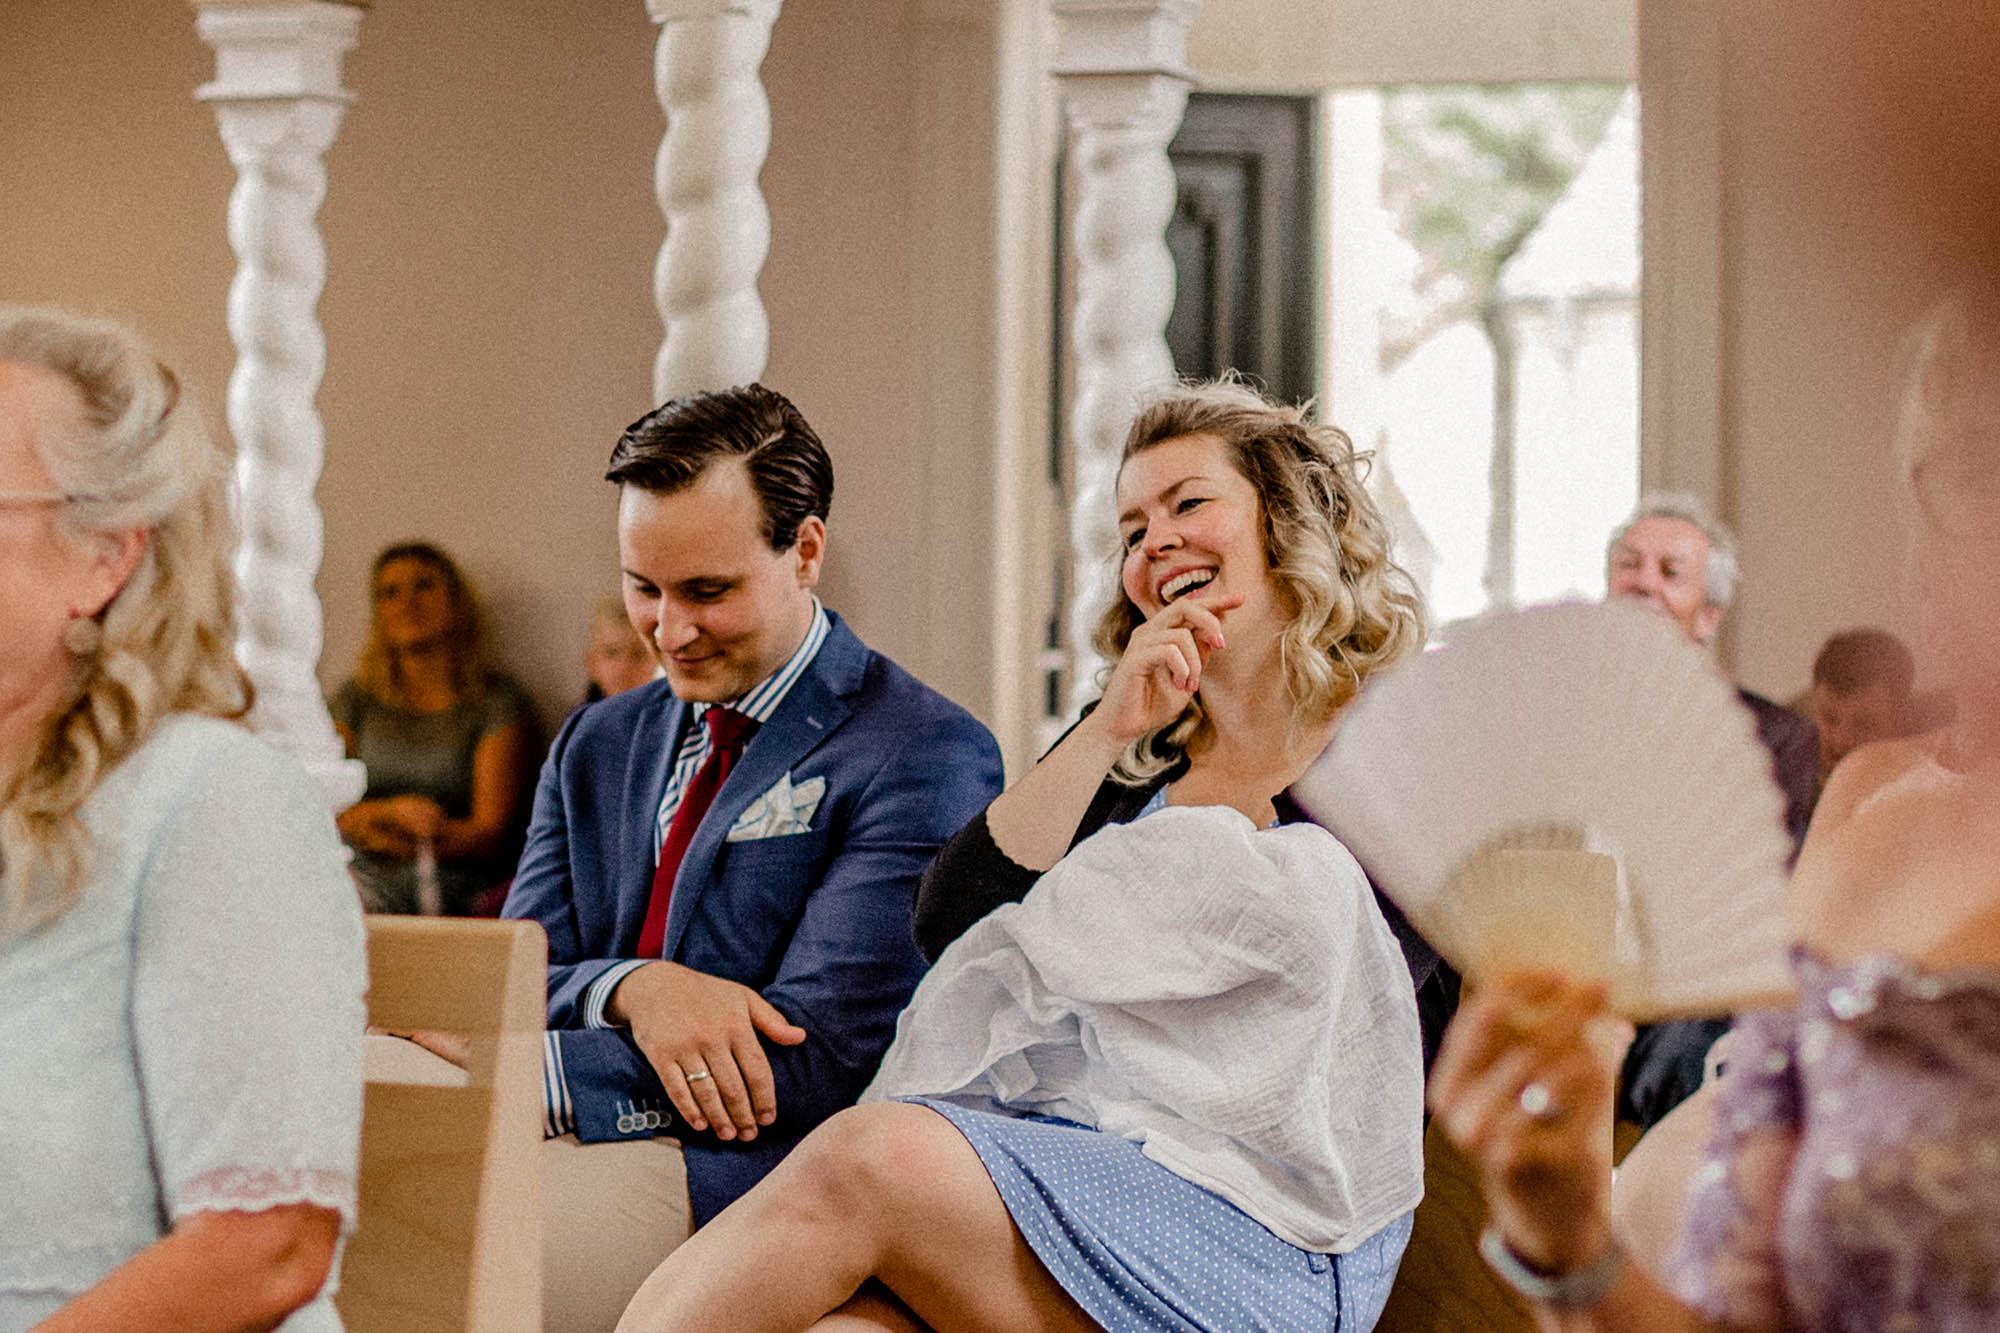 Virginia-Pech-Fotografie-Hochzeitsfotograf-Hochzeitsfotografie-Kulturscheune-Rangsdorf-Berlin-Anika-Nico-34